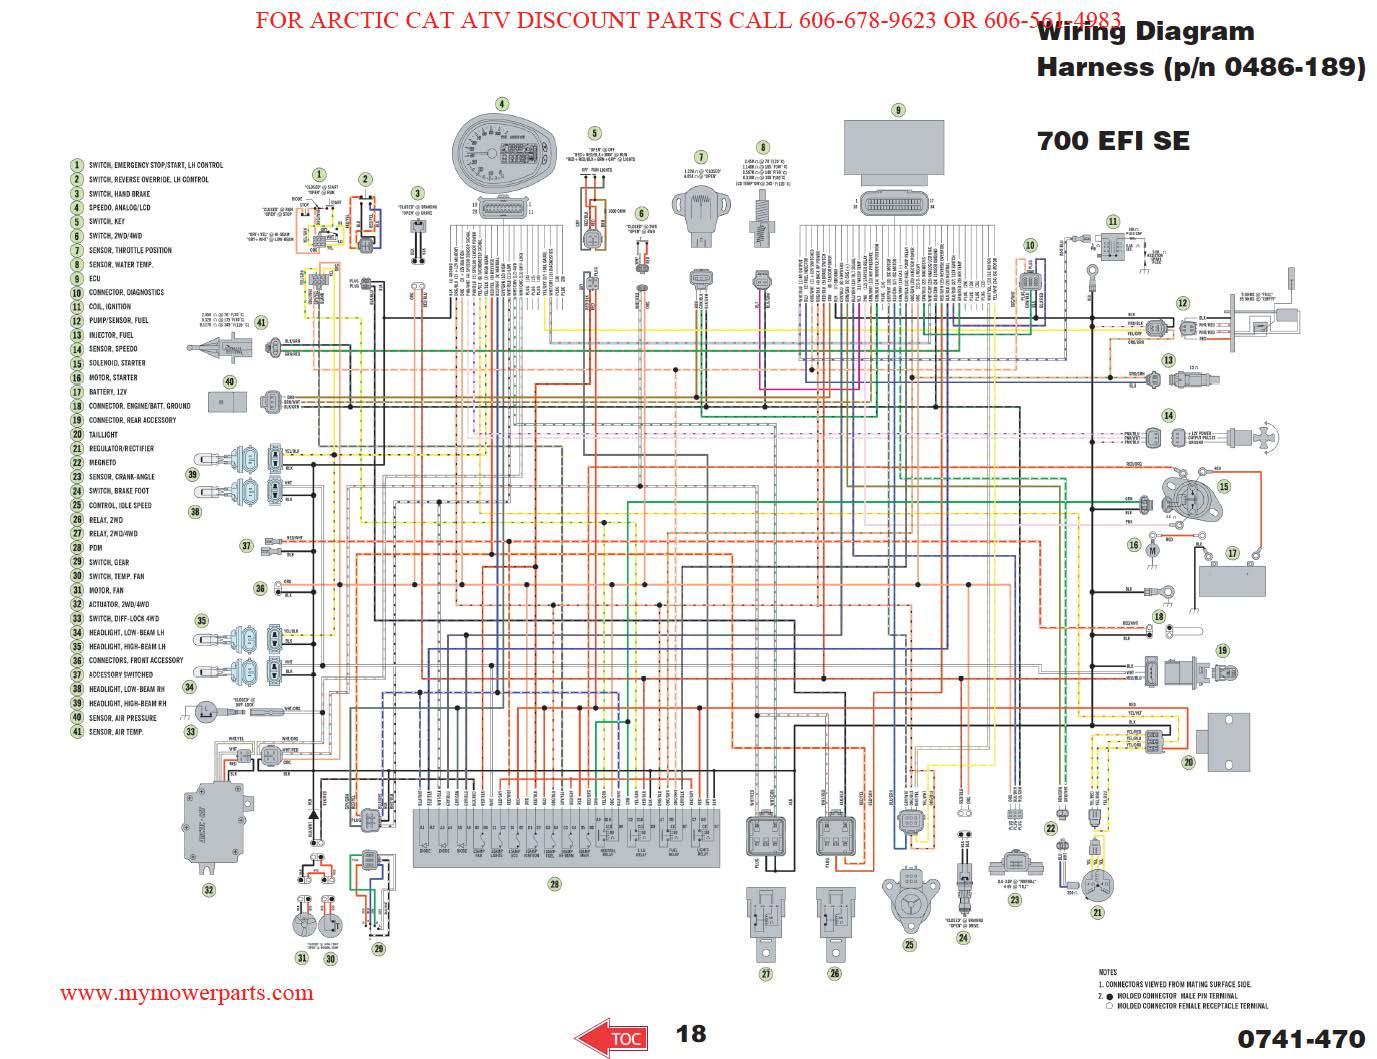 9588226105_edd5515f7d_o?resize\\\\\\\\\\\\\\\\\\\\\\\\\\\\\\\=665%2C511 5kcr49tn2235x starter wiring diagram accessory wiring diagram  at bayanpartner.co